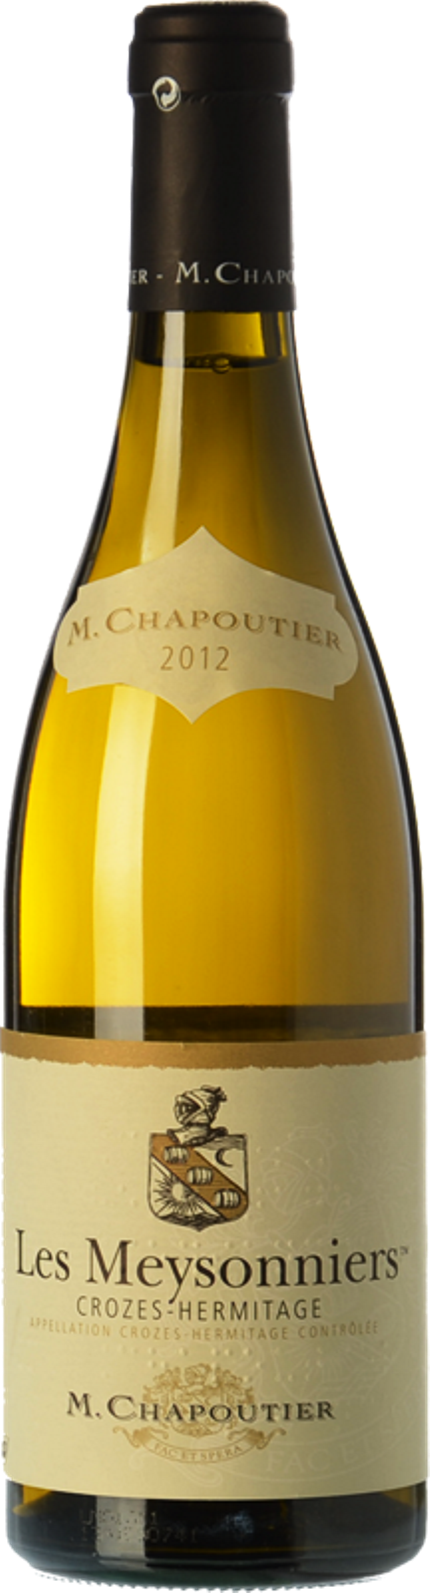 Crozes Hermitage AOC Meysonniers blanc 2017 BIO, M. Chapoutier